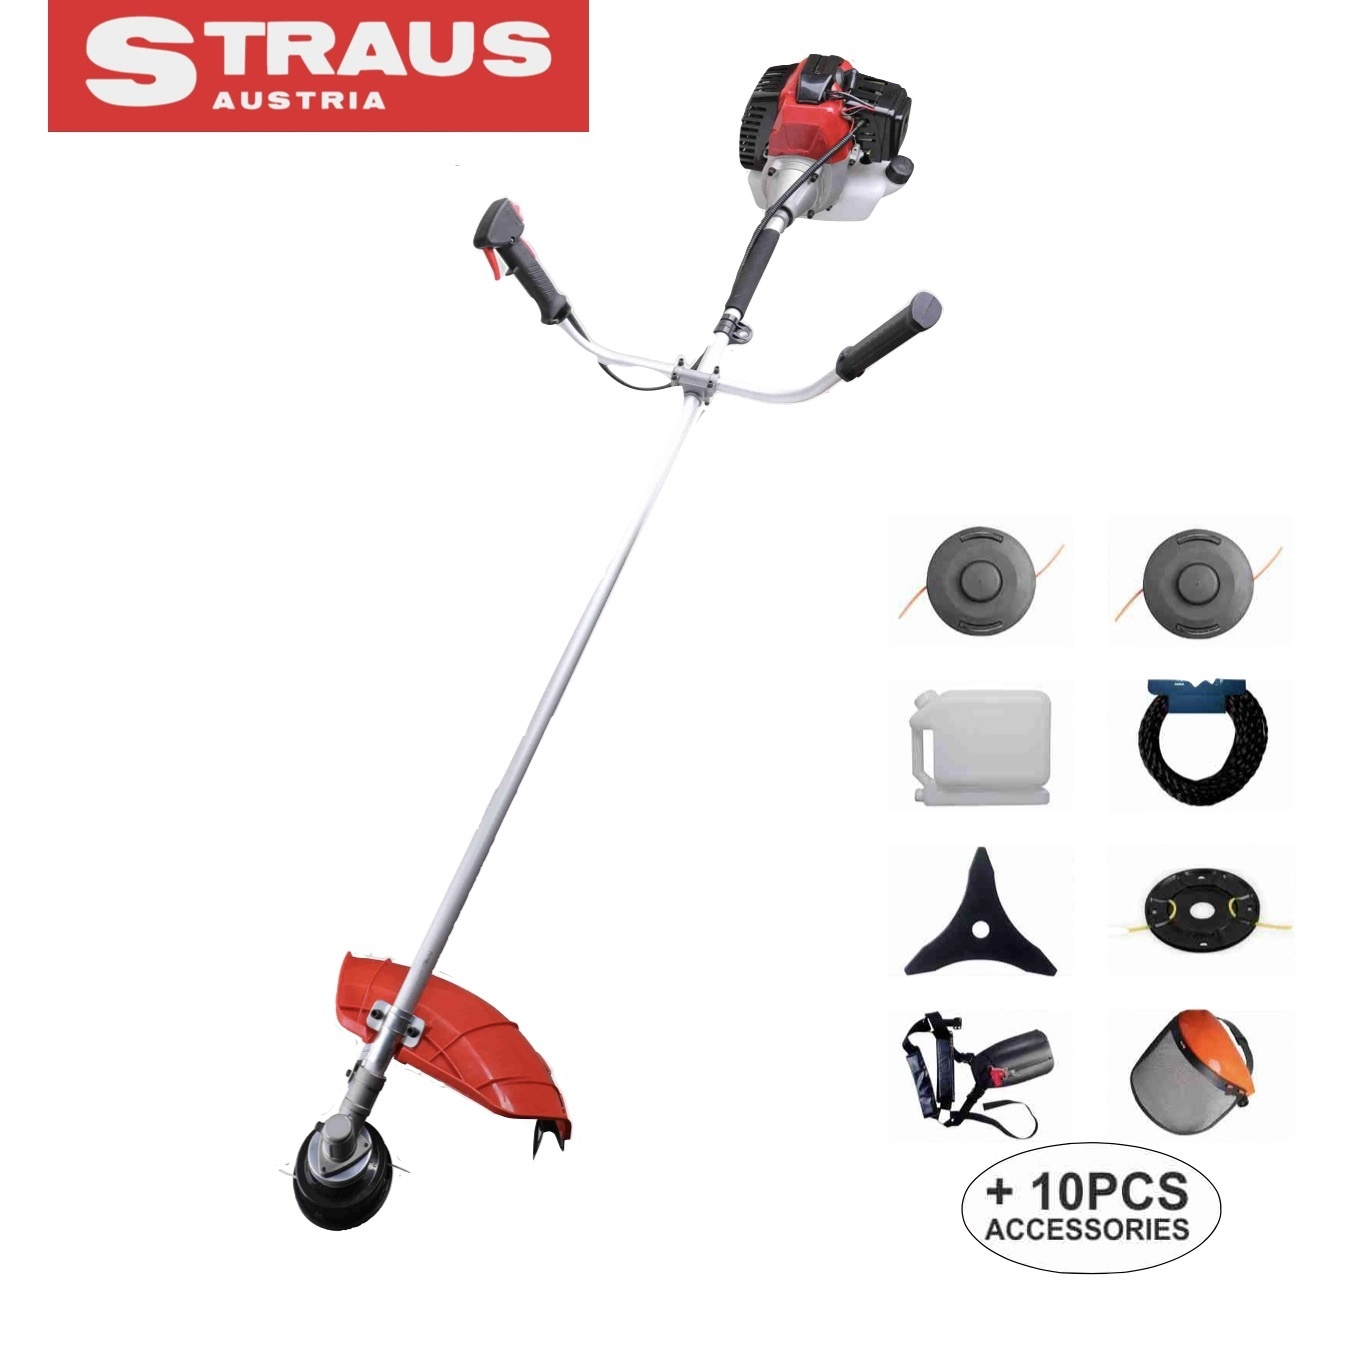 Straus Benzine Bosmaaier 52cc 5,2pK + 10 accessoires